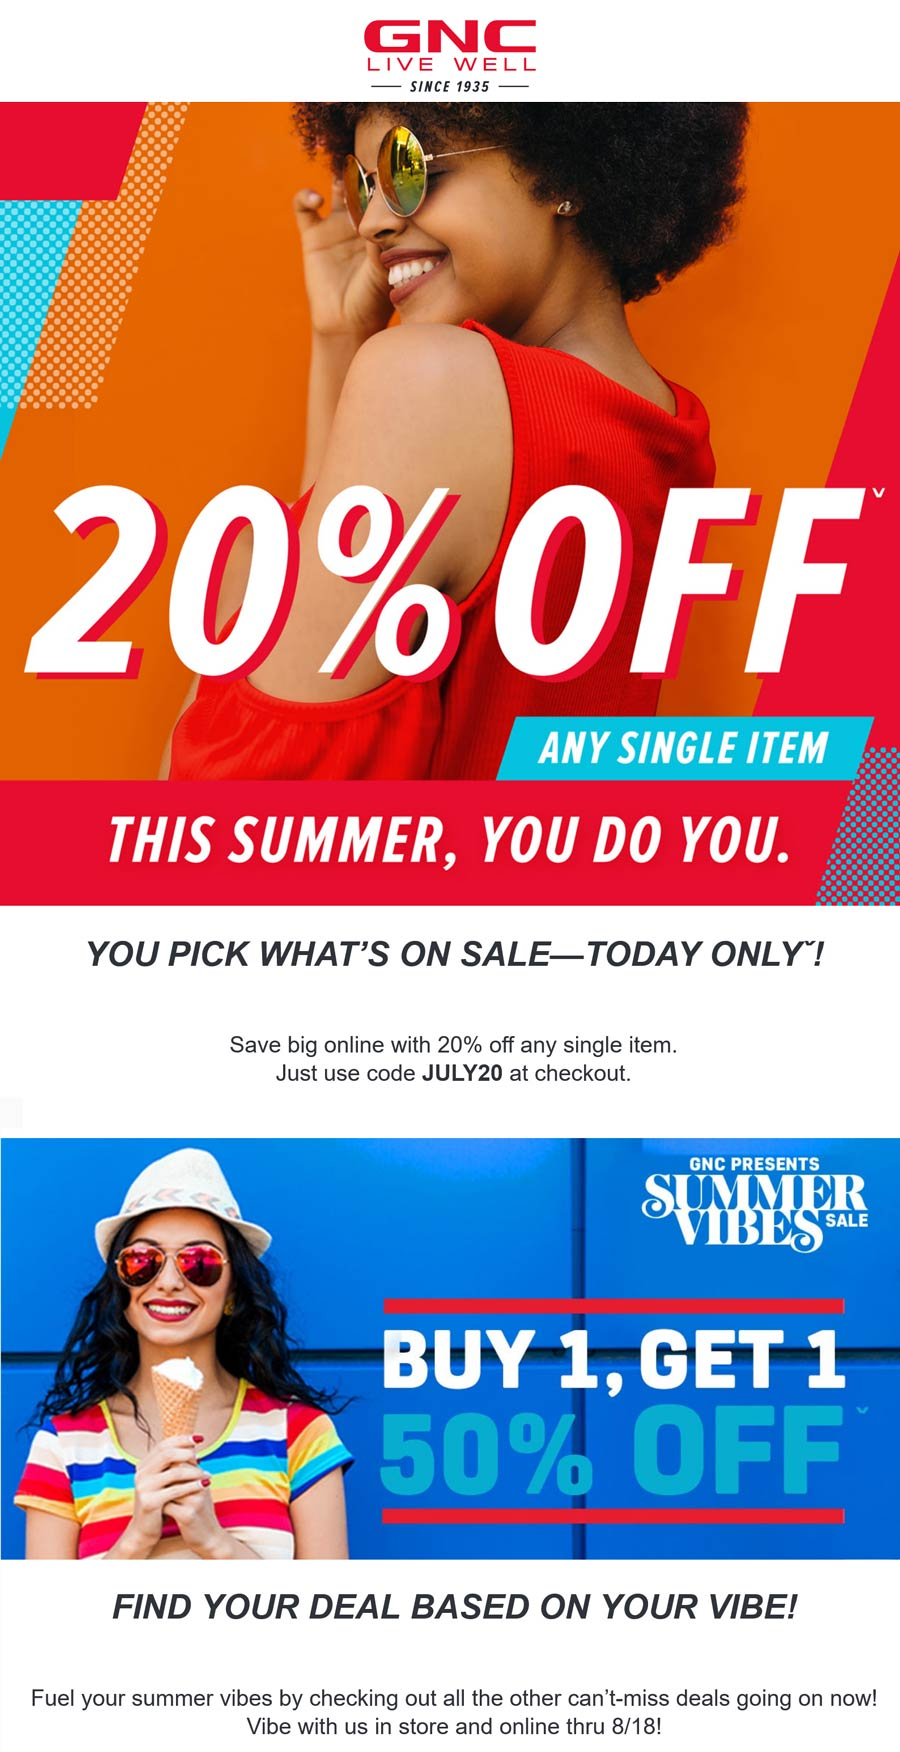 GNC stores Coupon  20% off a single item online today at GNC via promo code JULY20 #gnc